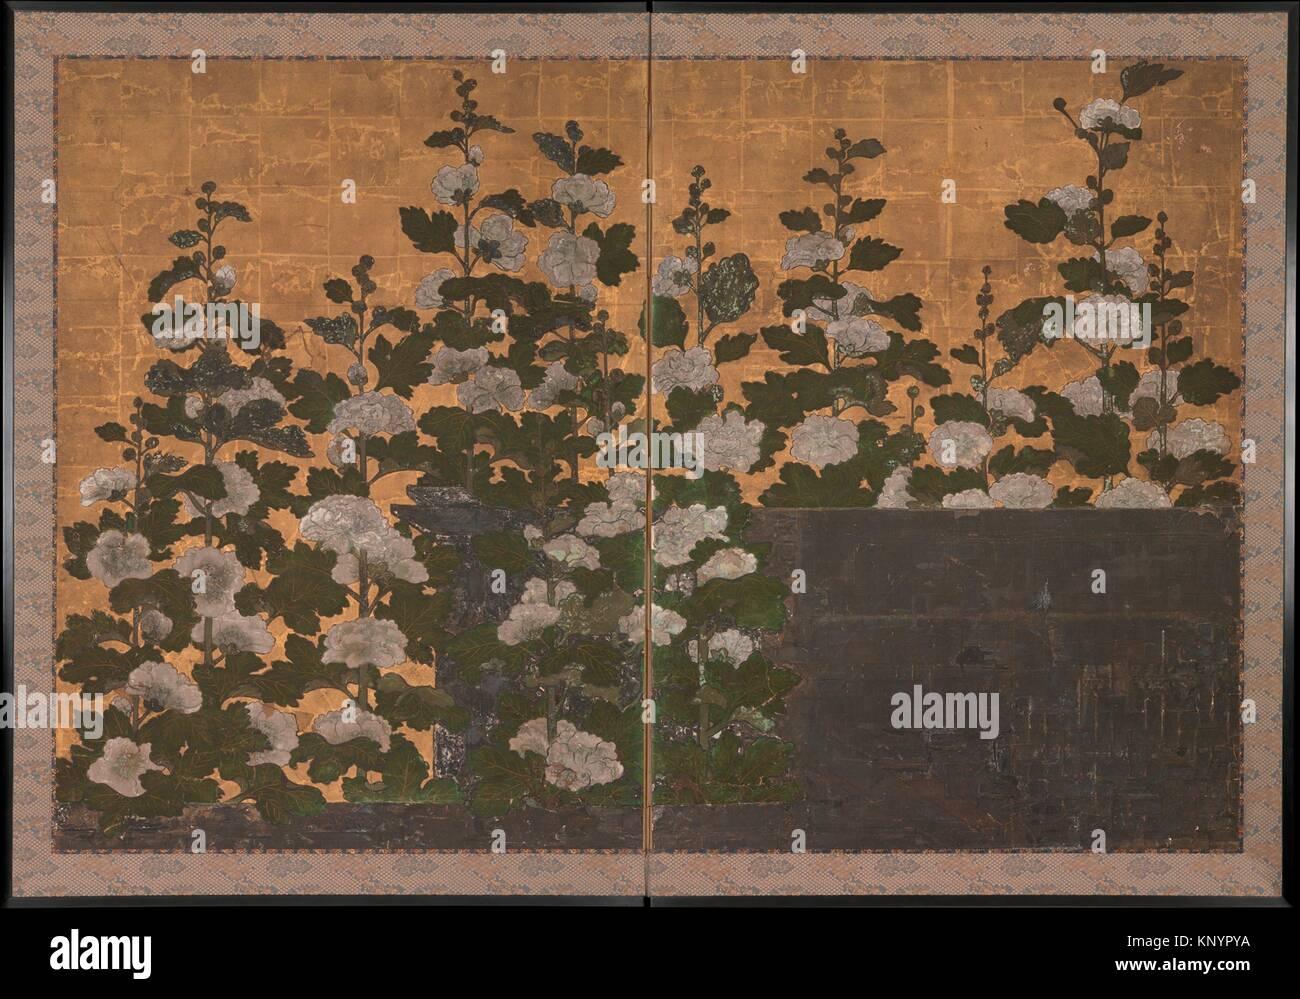 Hollyhocks. Period: Edo period (1615-1868); Date: 17th century; Culture: Japan; Medium: Two-panel folding screen; Stock Photo